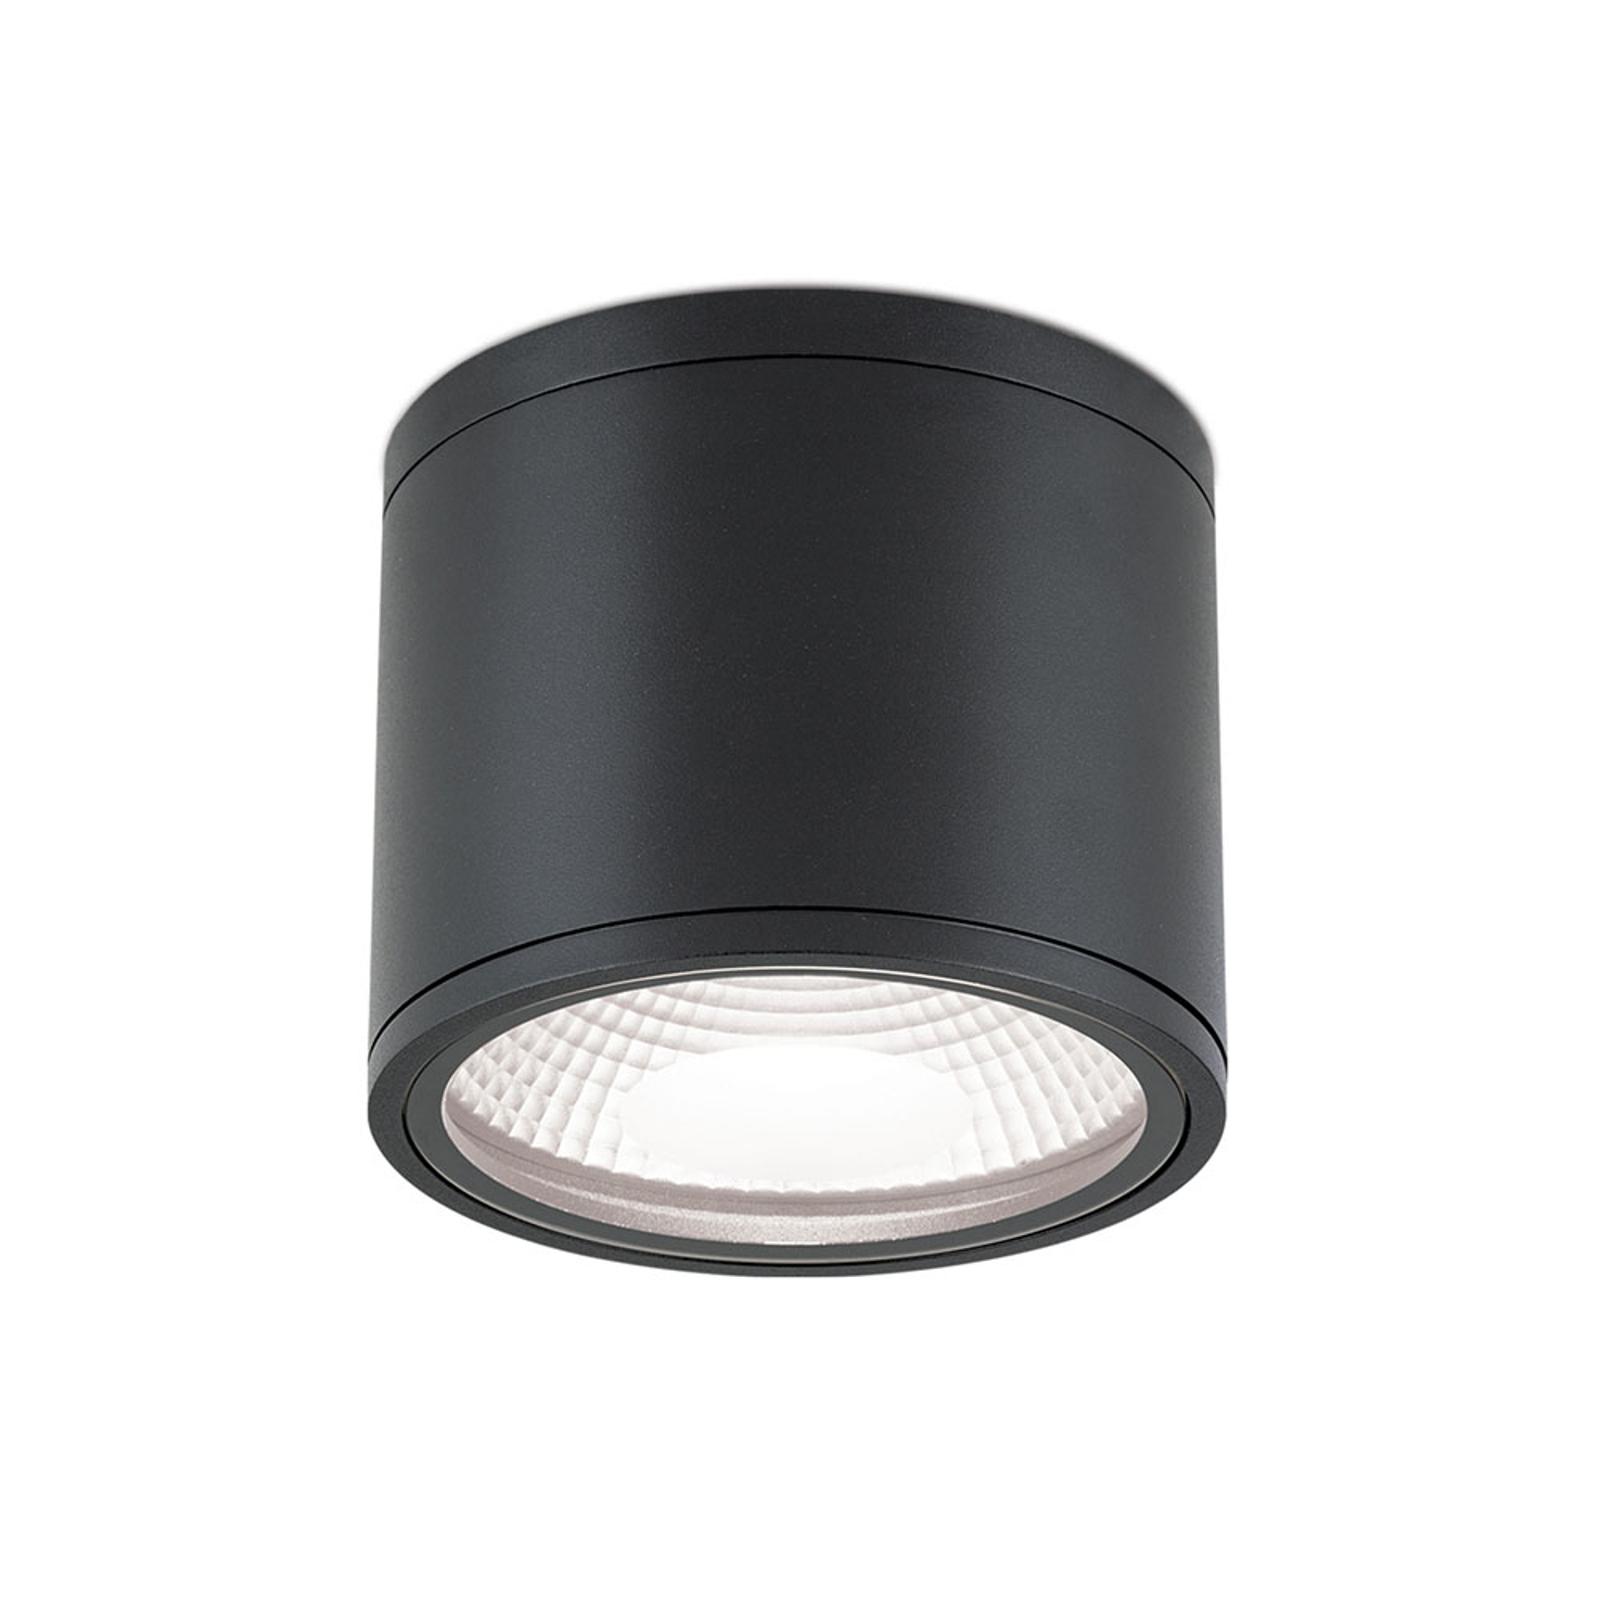 LED plafondlamp Sputnik IP65 Ø 14,5 cm zwart